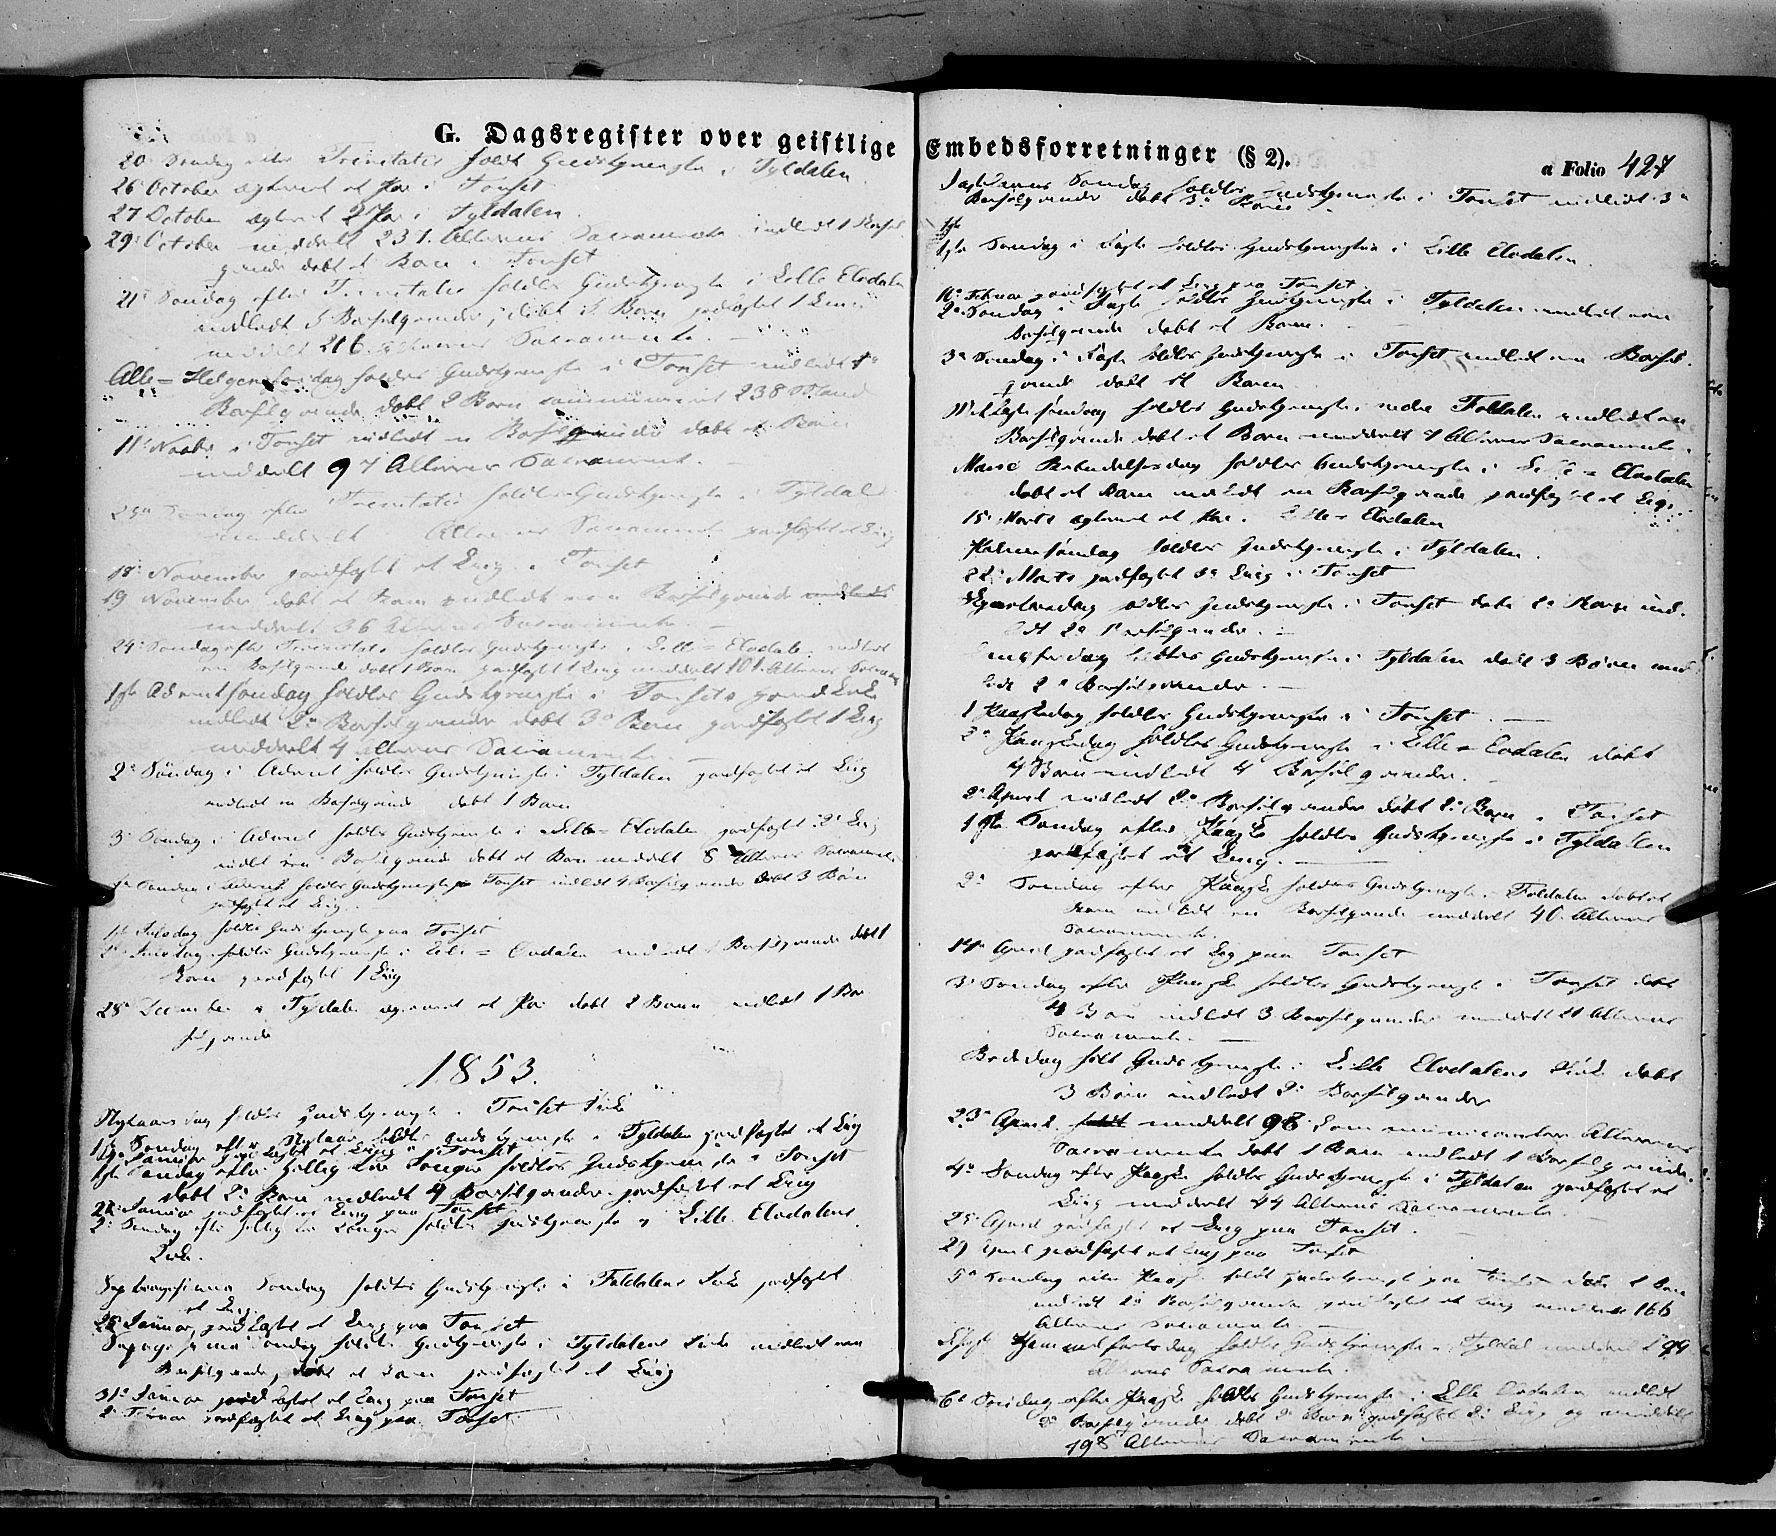 SAH, Tynset prestekontor, Ministerialbok nr. 20, 1848-1862, s. 427